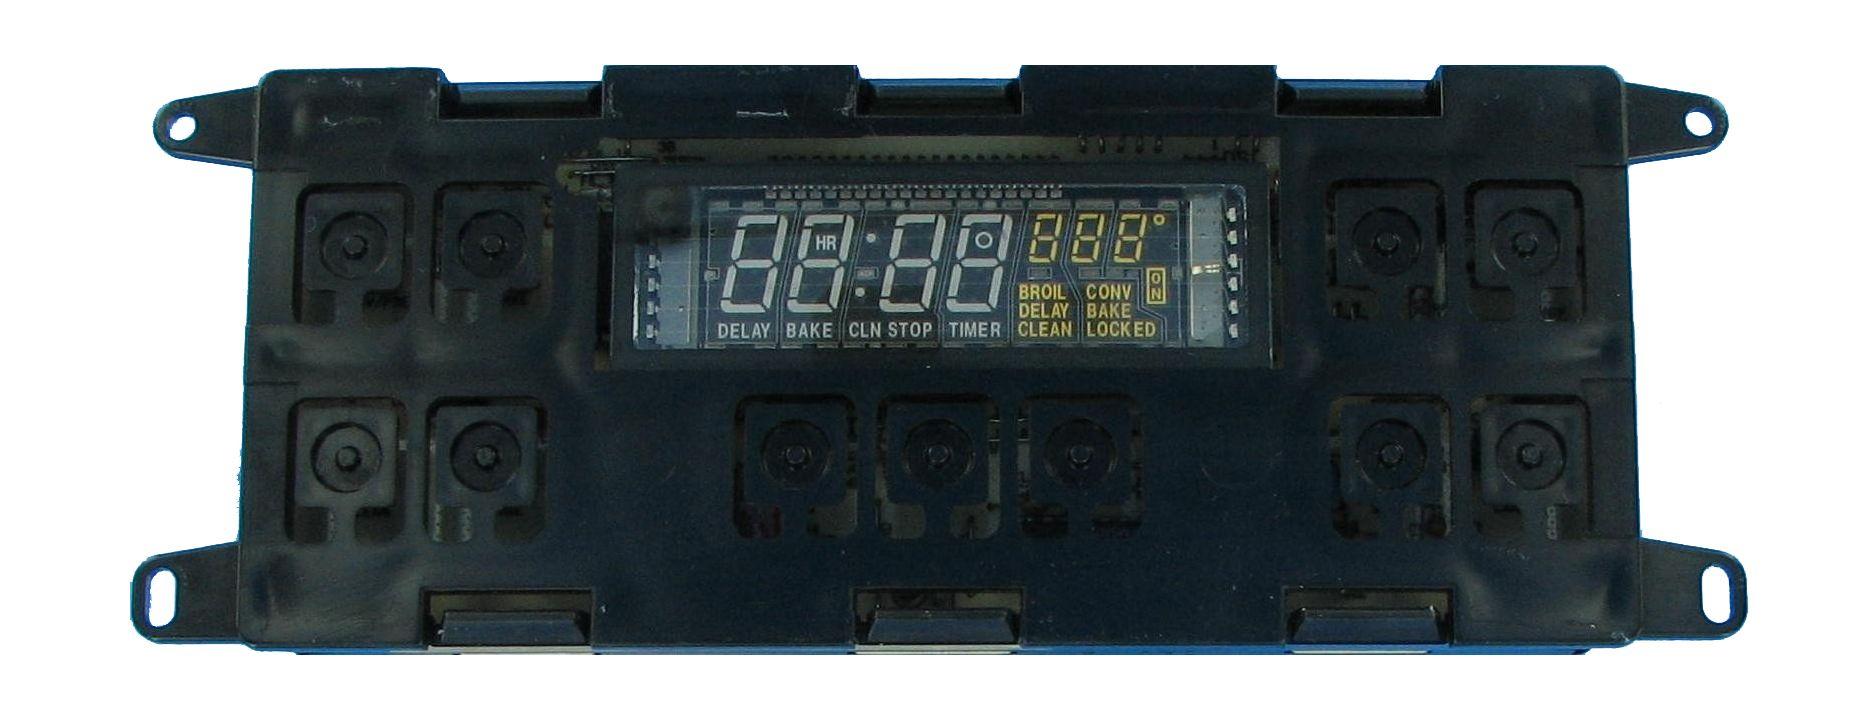 Frigidaire electrolux 316080011 range clocktimer